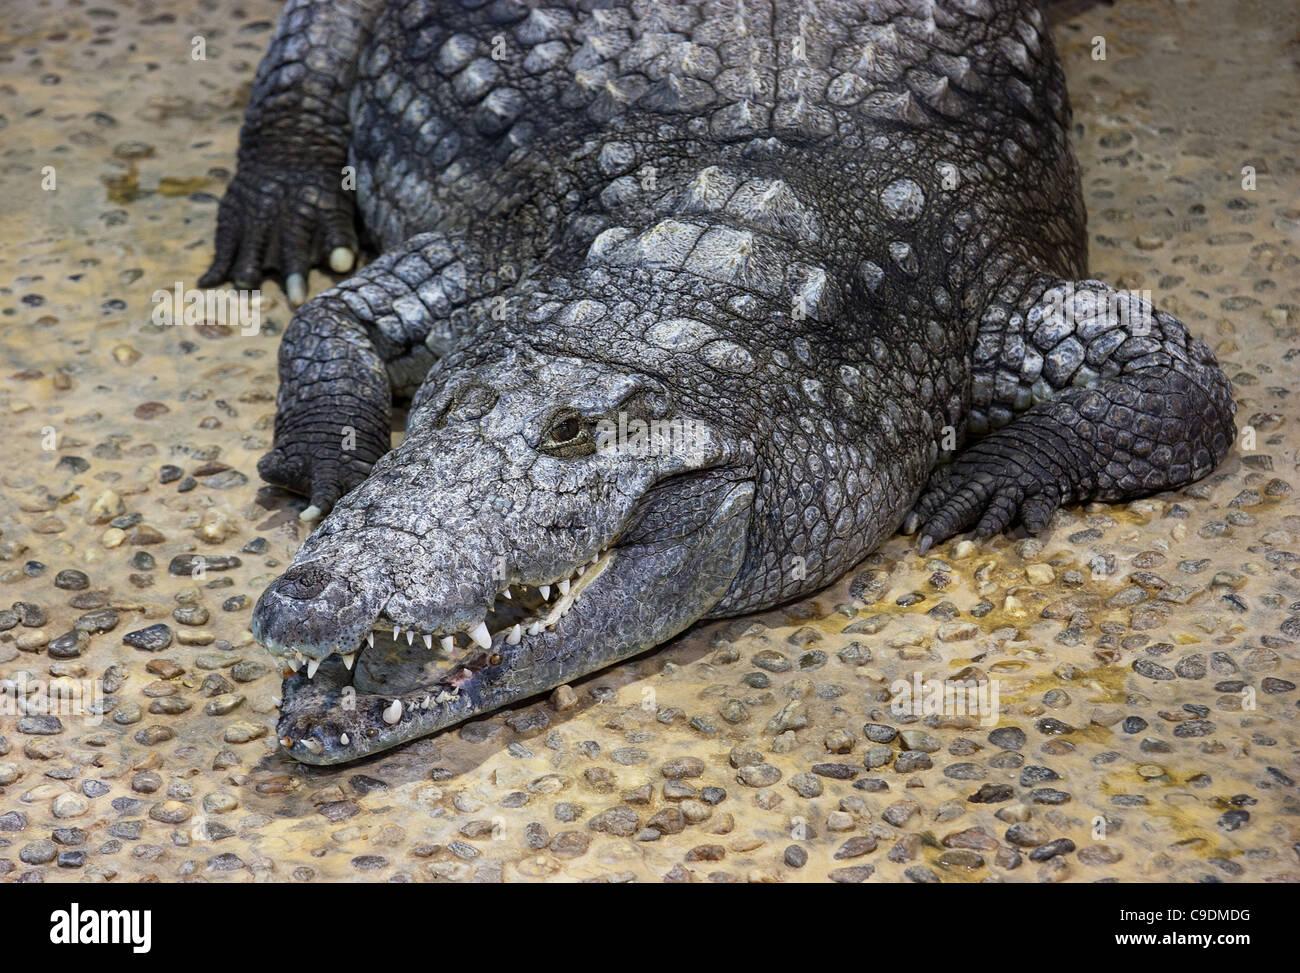 A big, grey crocodile is resting - Stock Image